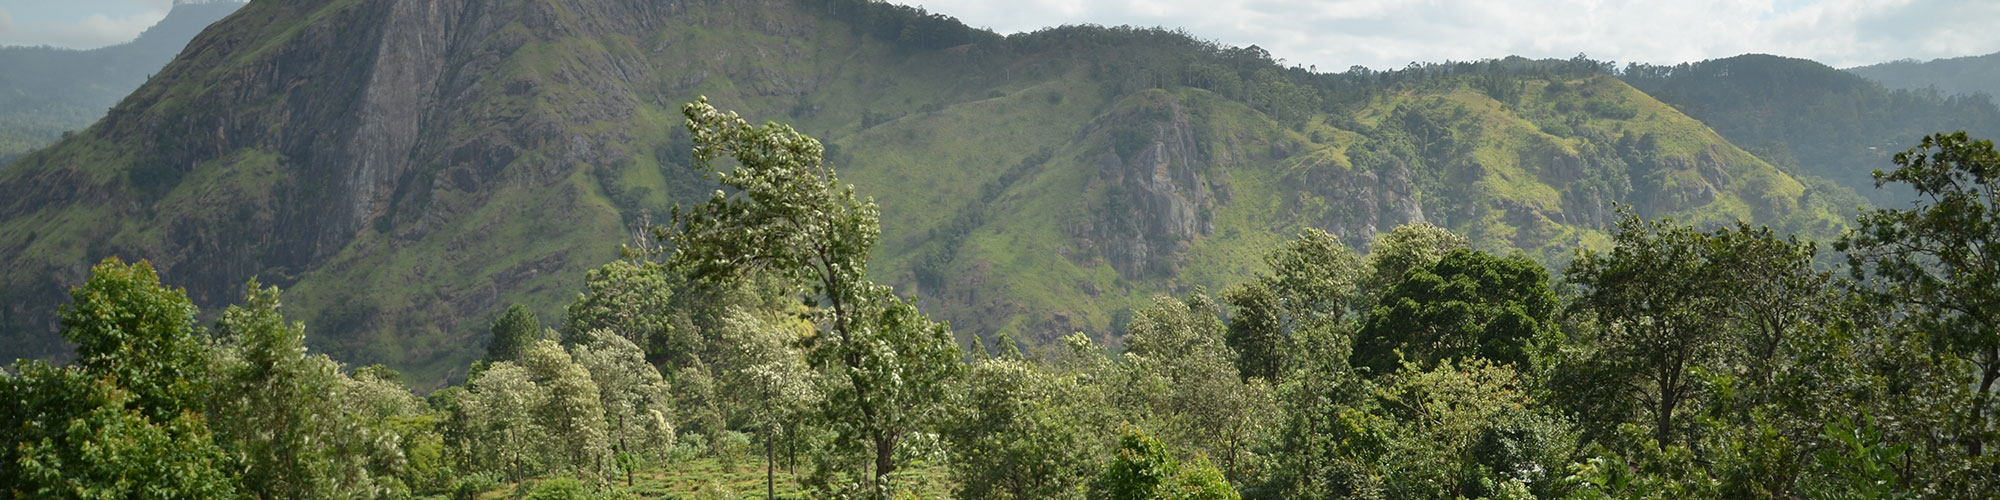 Forest hiking in Sri Lanka